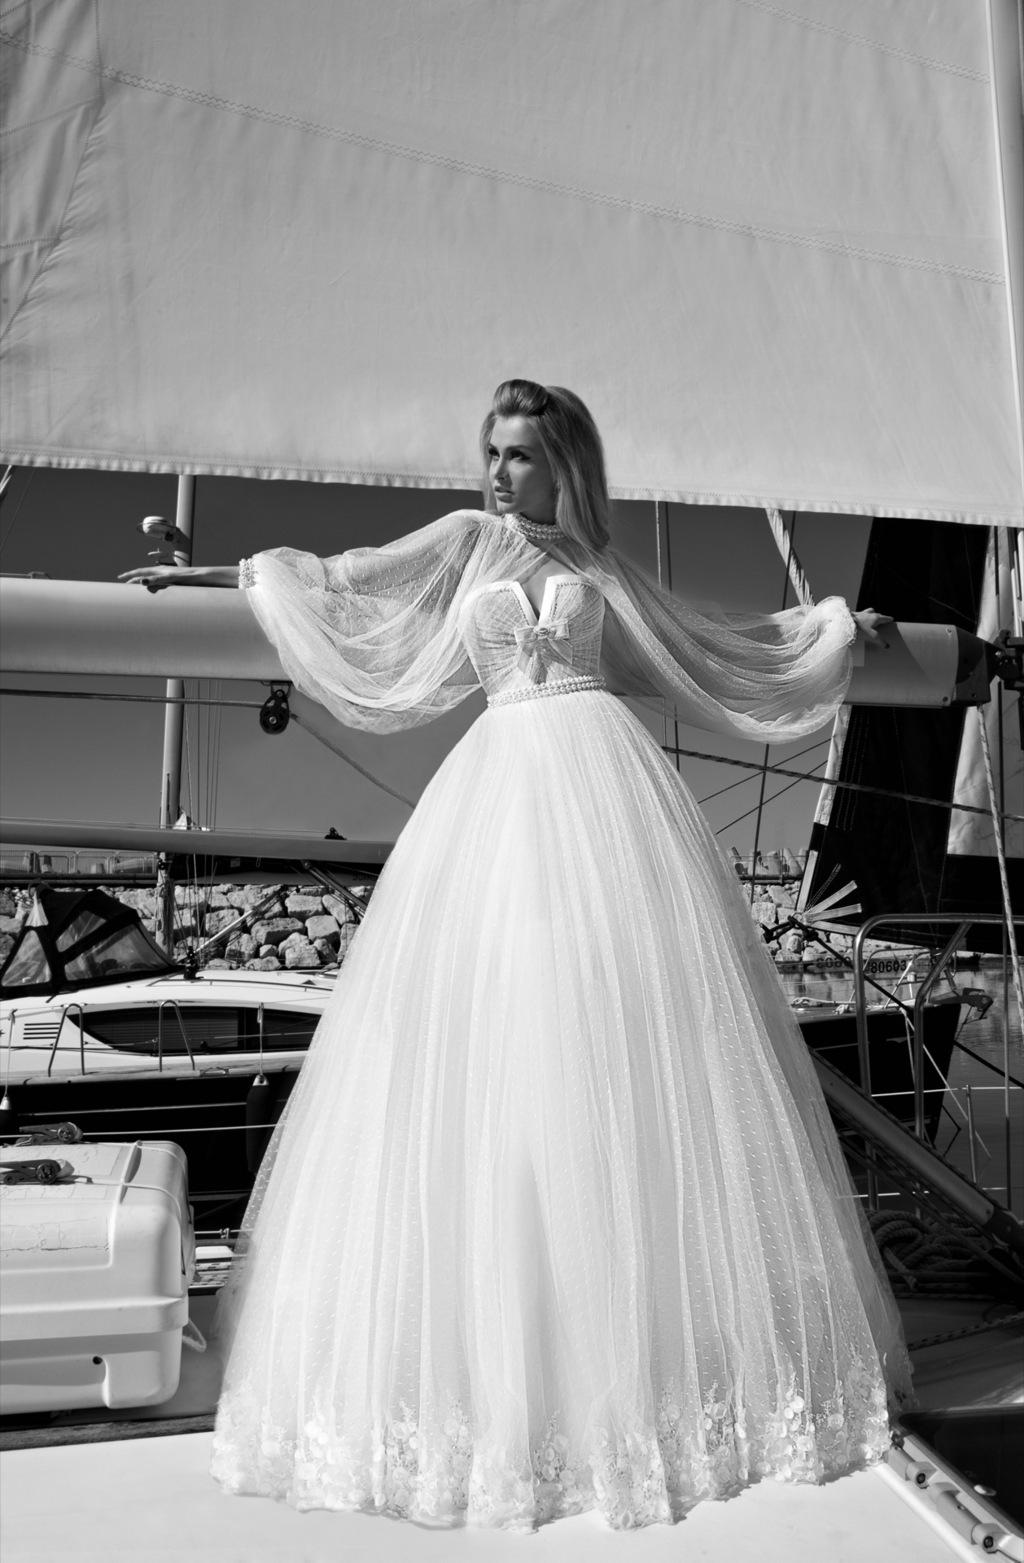 2013-wedding-dress-galia-lahav-bridal-adele.full